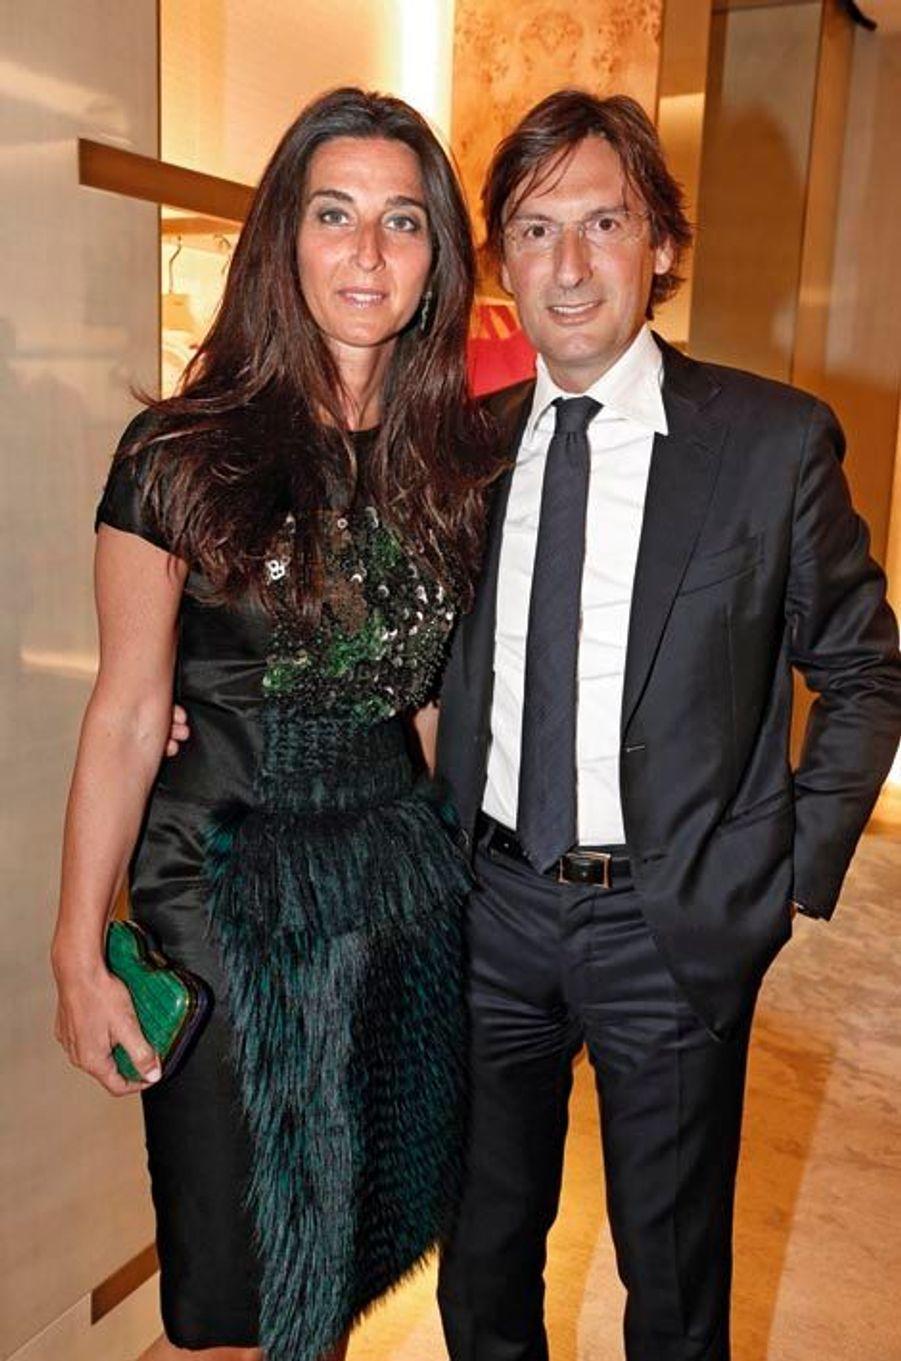 Elisabetta et Pietro Beccari, président de Fendi